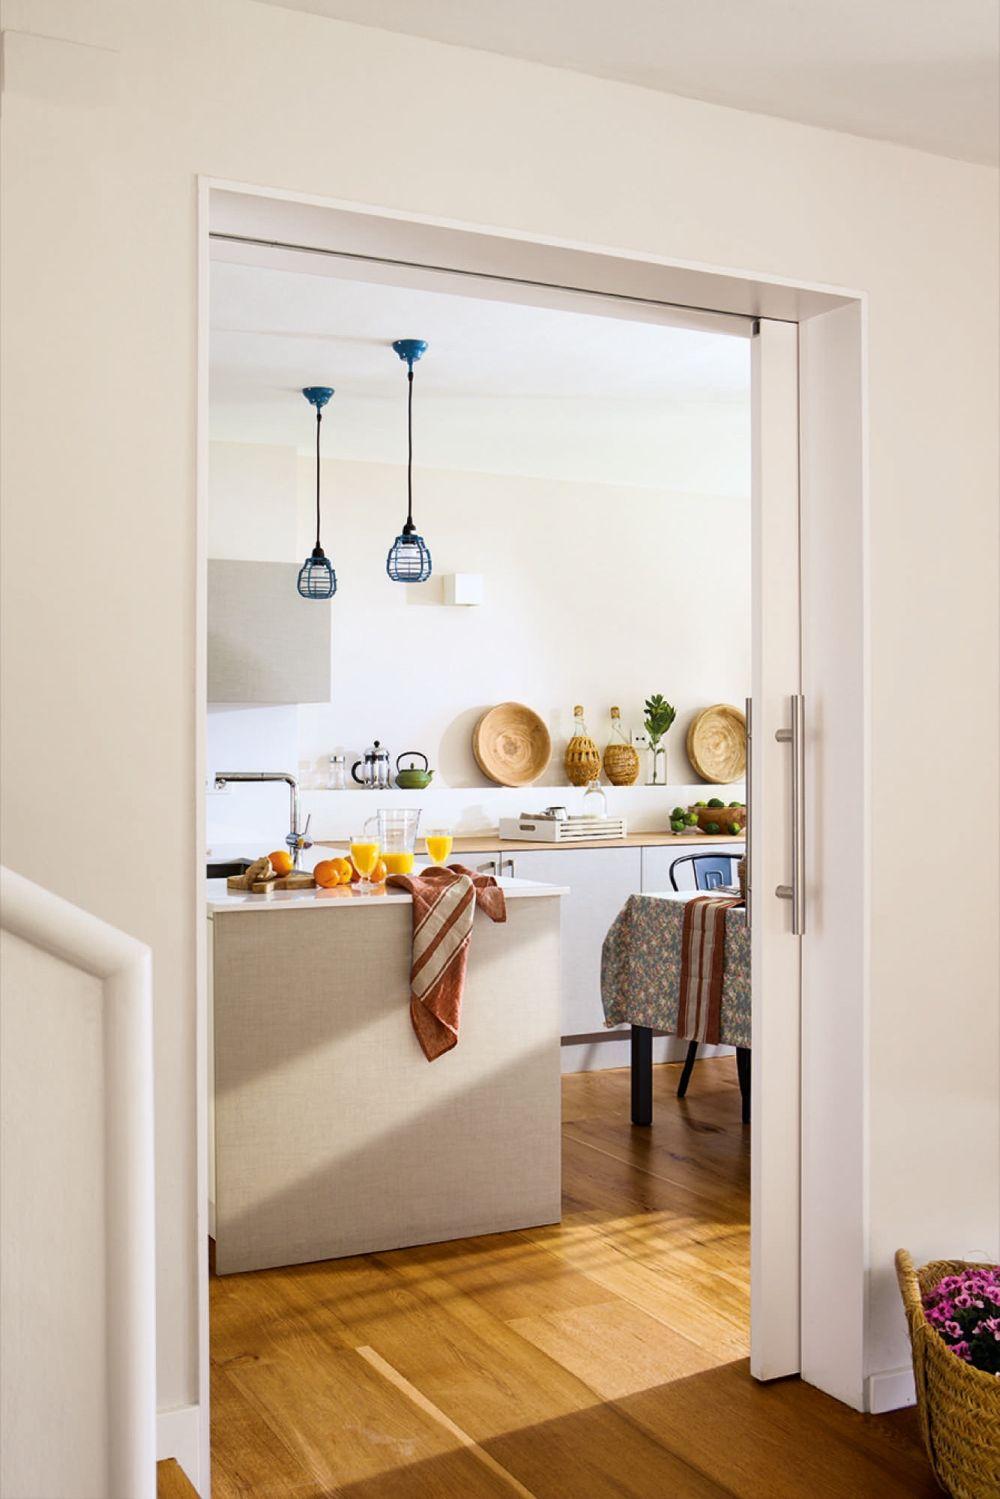 adelaparvu.com despre casa cu gradina, accente marine, designer Jeanette Dresing, Foto Feran Freixa (10)